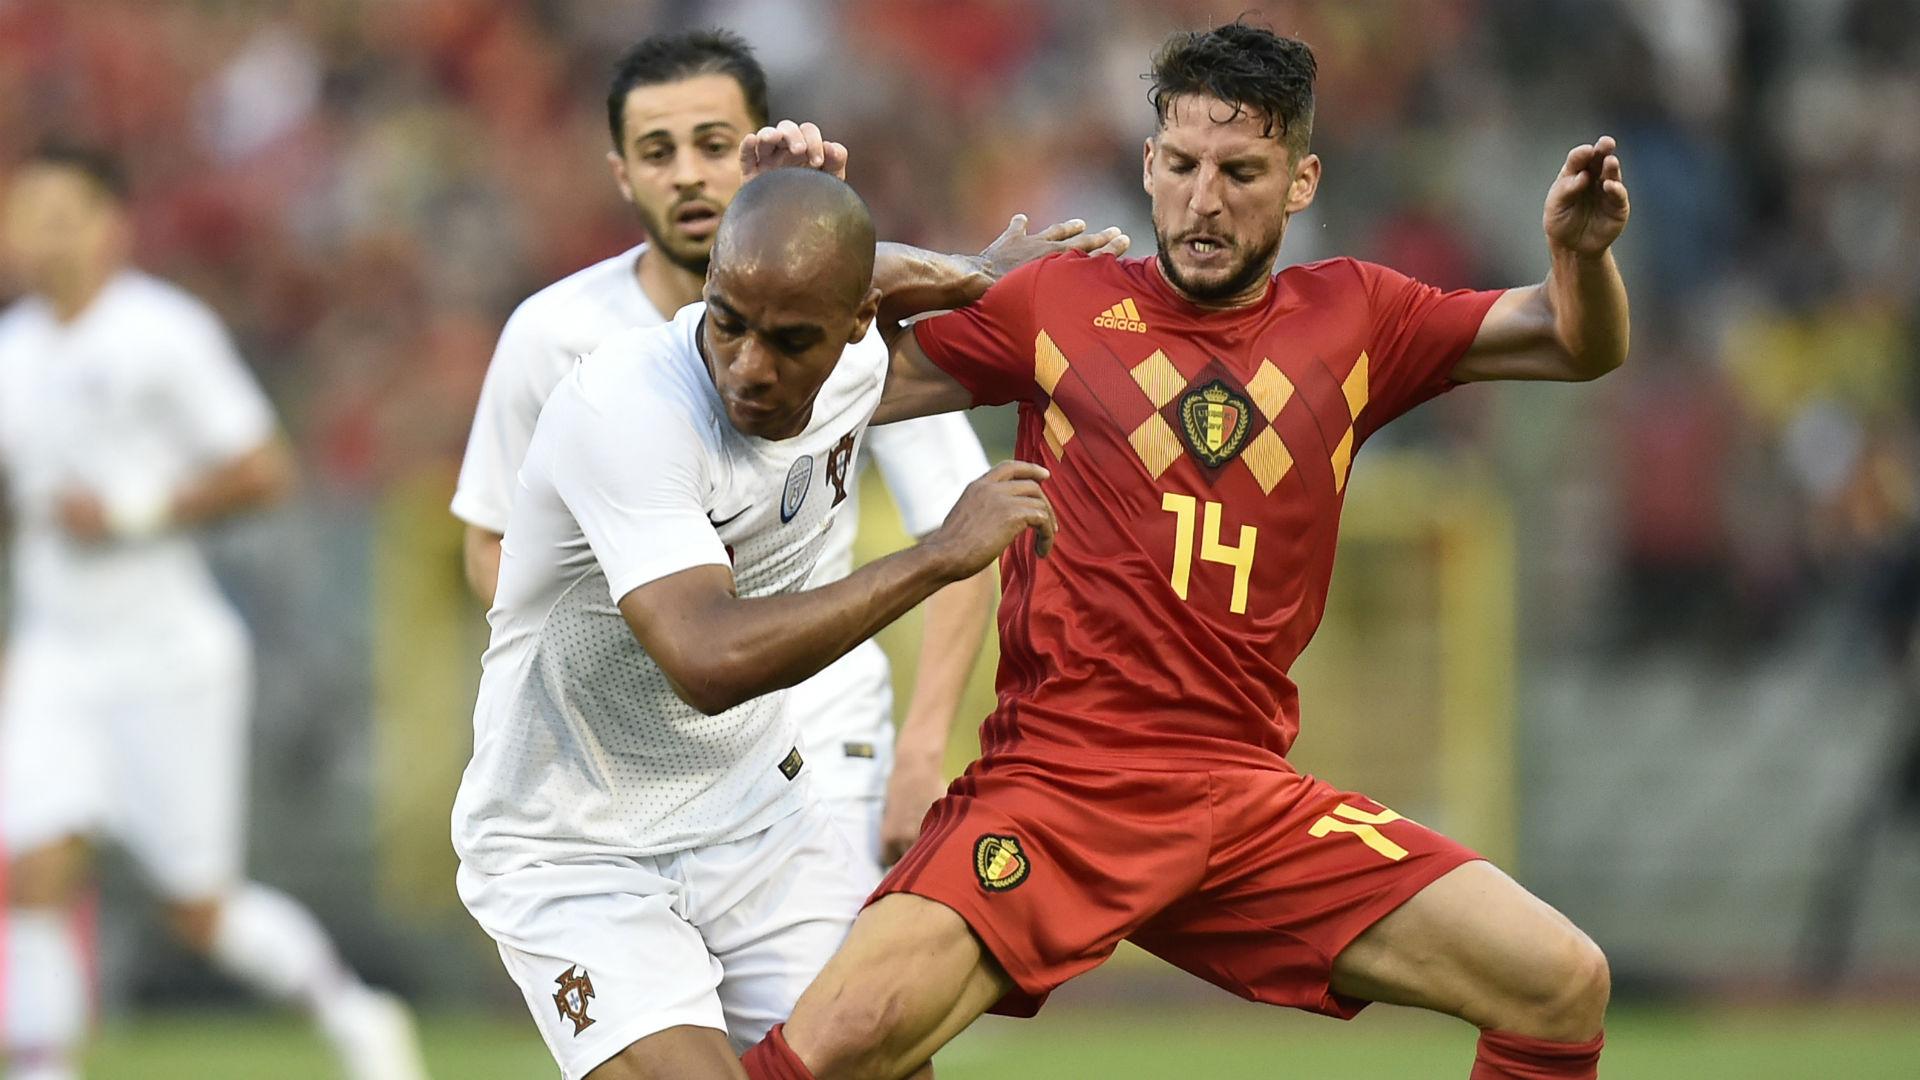 Dries Mertens Joao Mario Belgium Portugal international friendly 2018